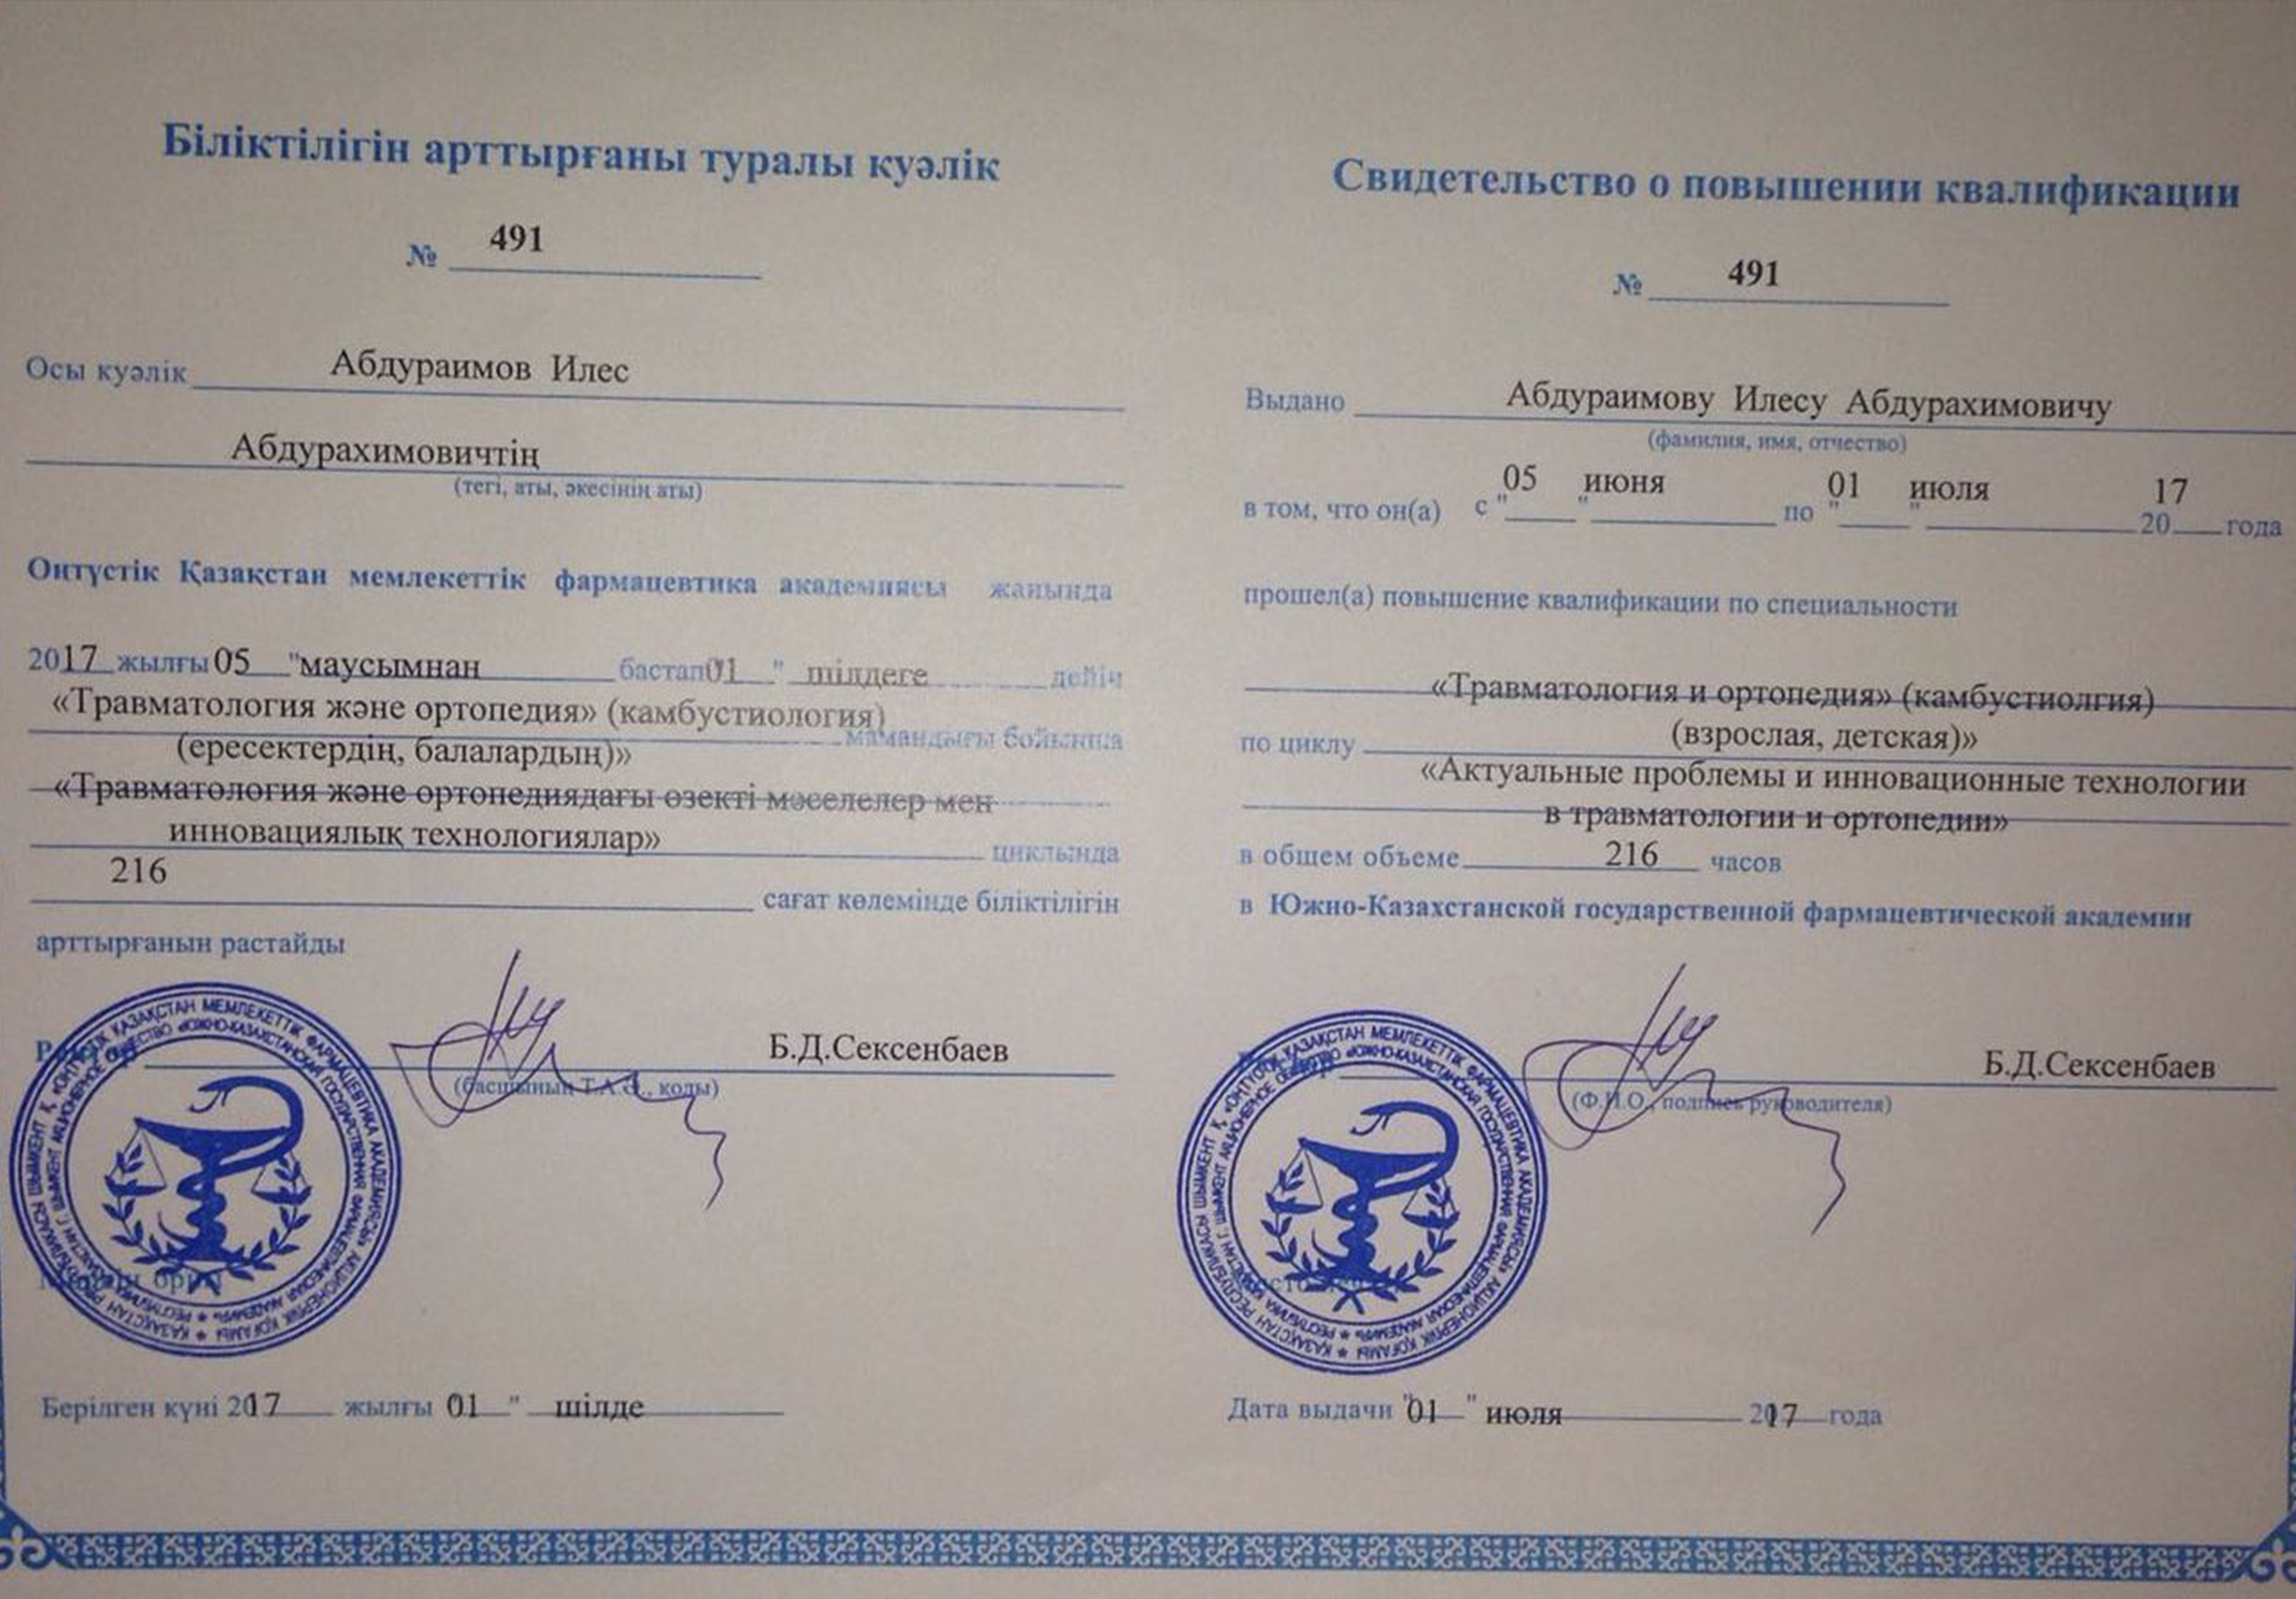 Квалификация Травматолога клиники Akniet Shipa сайрамский р-н. с. Карабулак